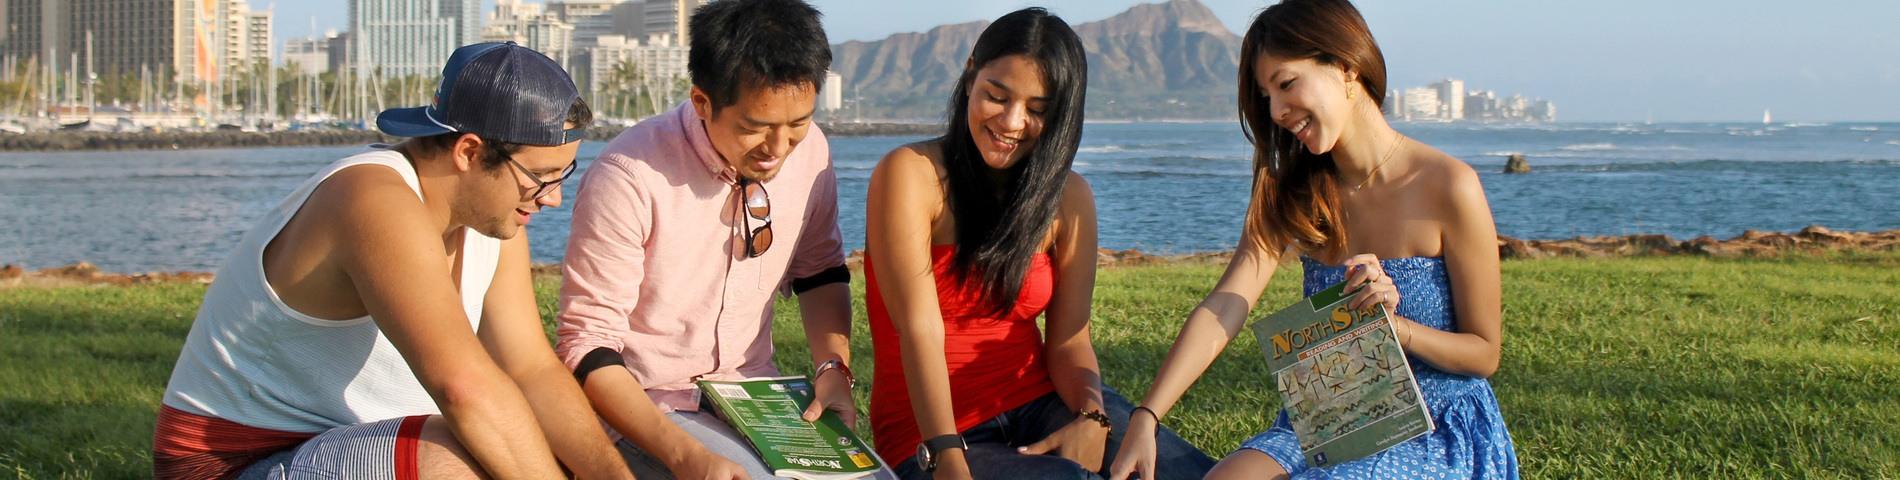 Intercultural Communications College画像1